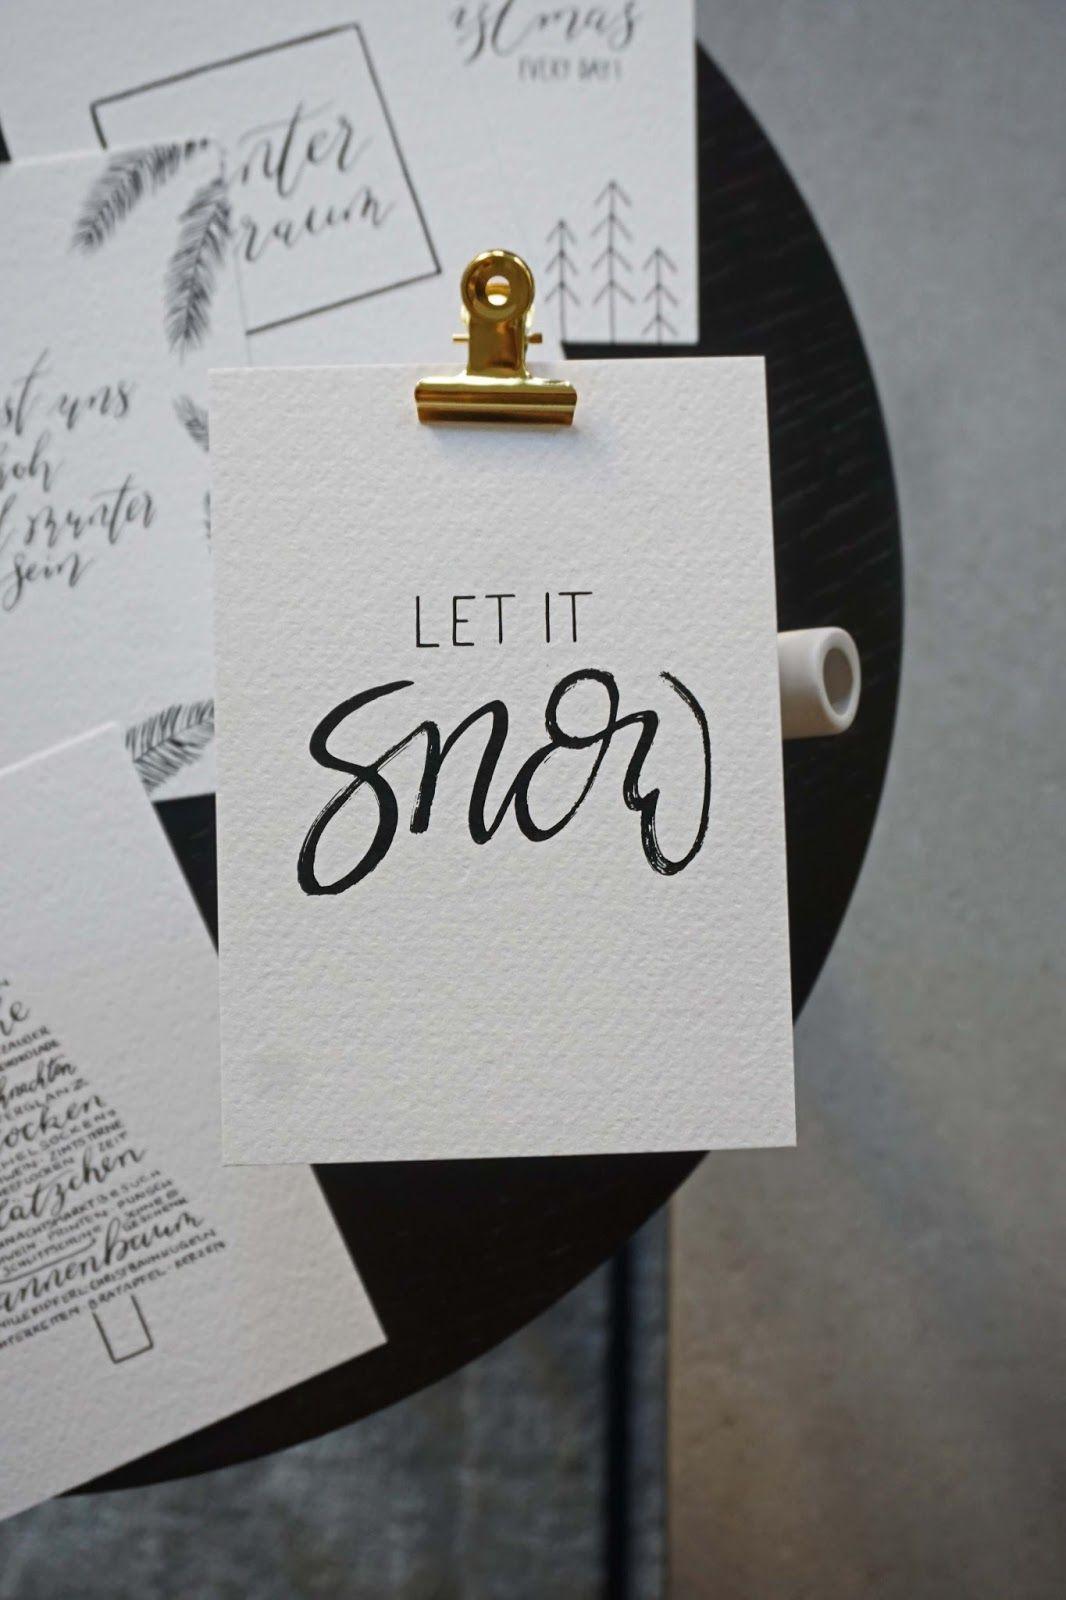 dezembertr ume x mas frohe weihnachten kalligraphie. Black Bedroom Furniture Sets. Home Design Ideas